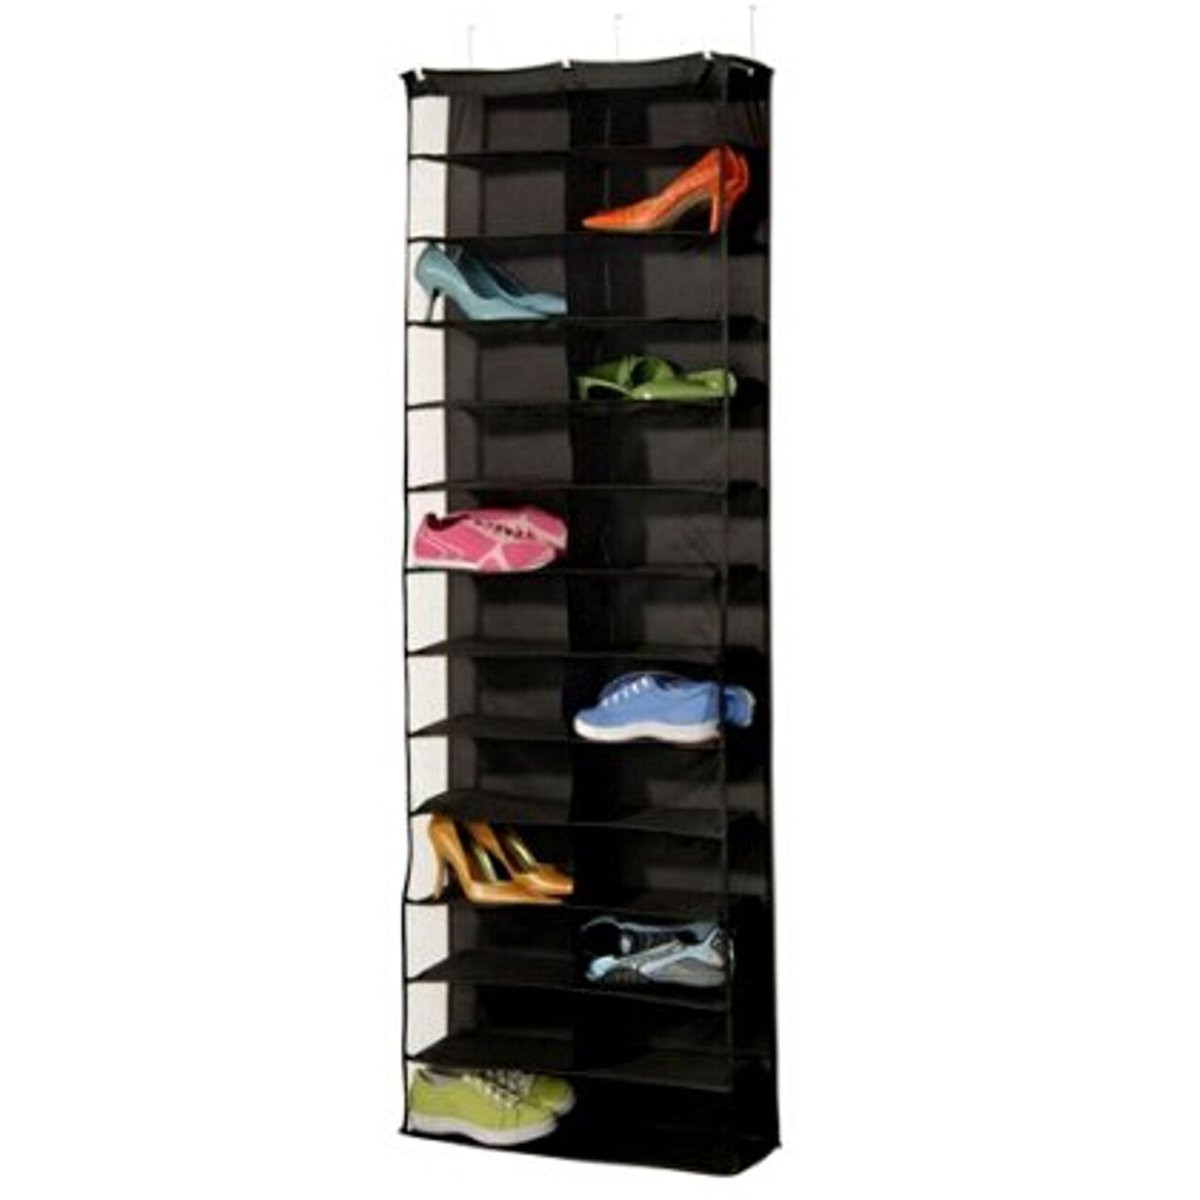 Amazing Door Wall Hanging Shelf 26 Pairs Shoe Rack Bag Shoes Stand Storage Holder Home Living Room Organizer(China (Mainland))